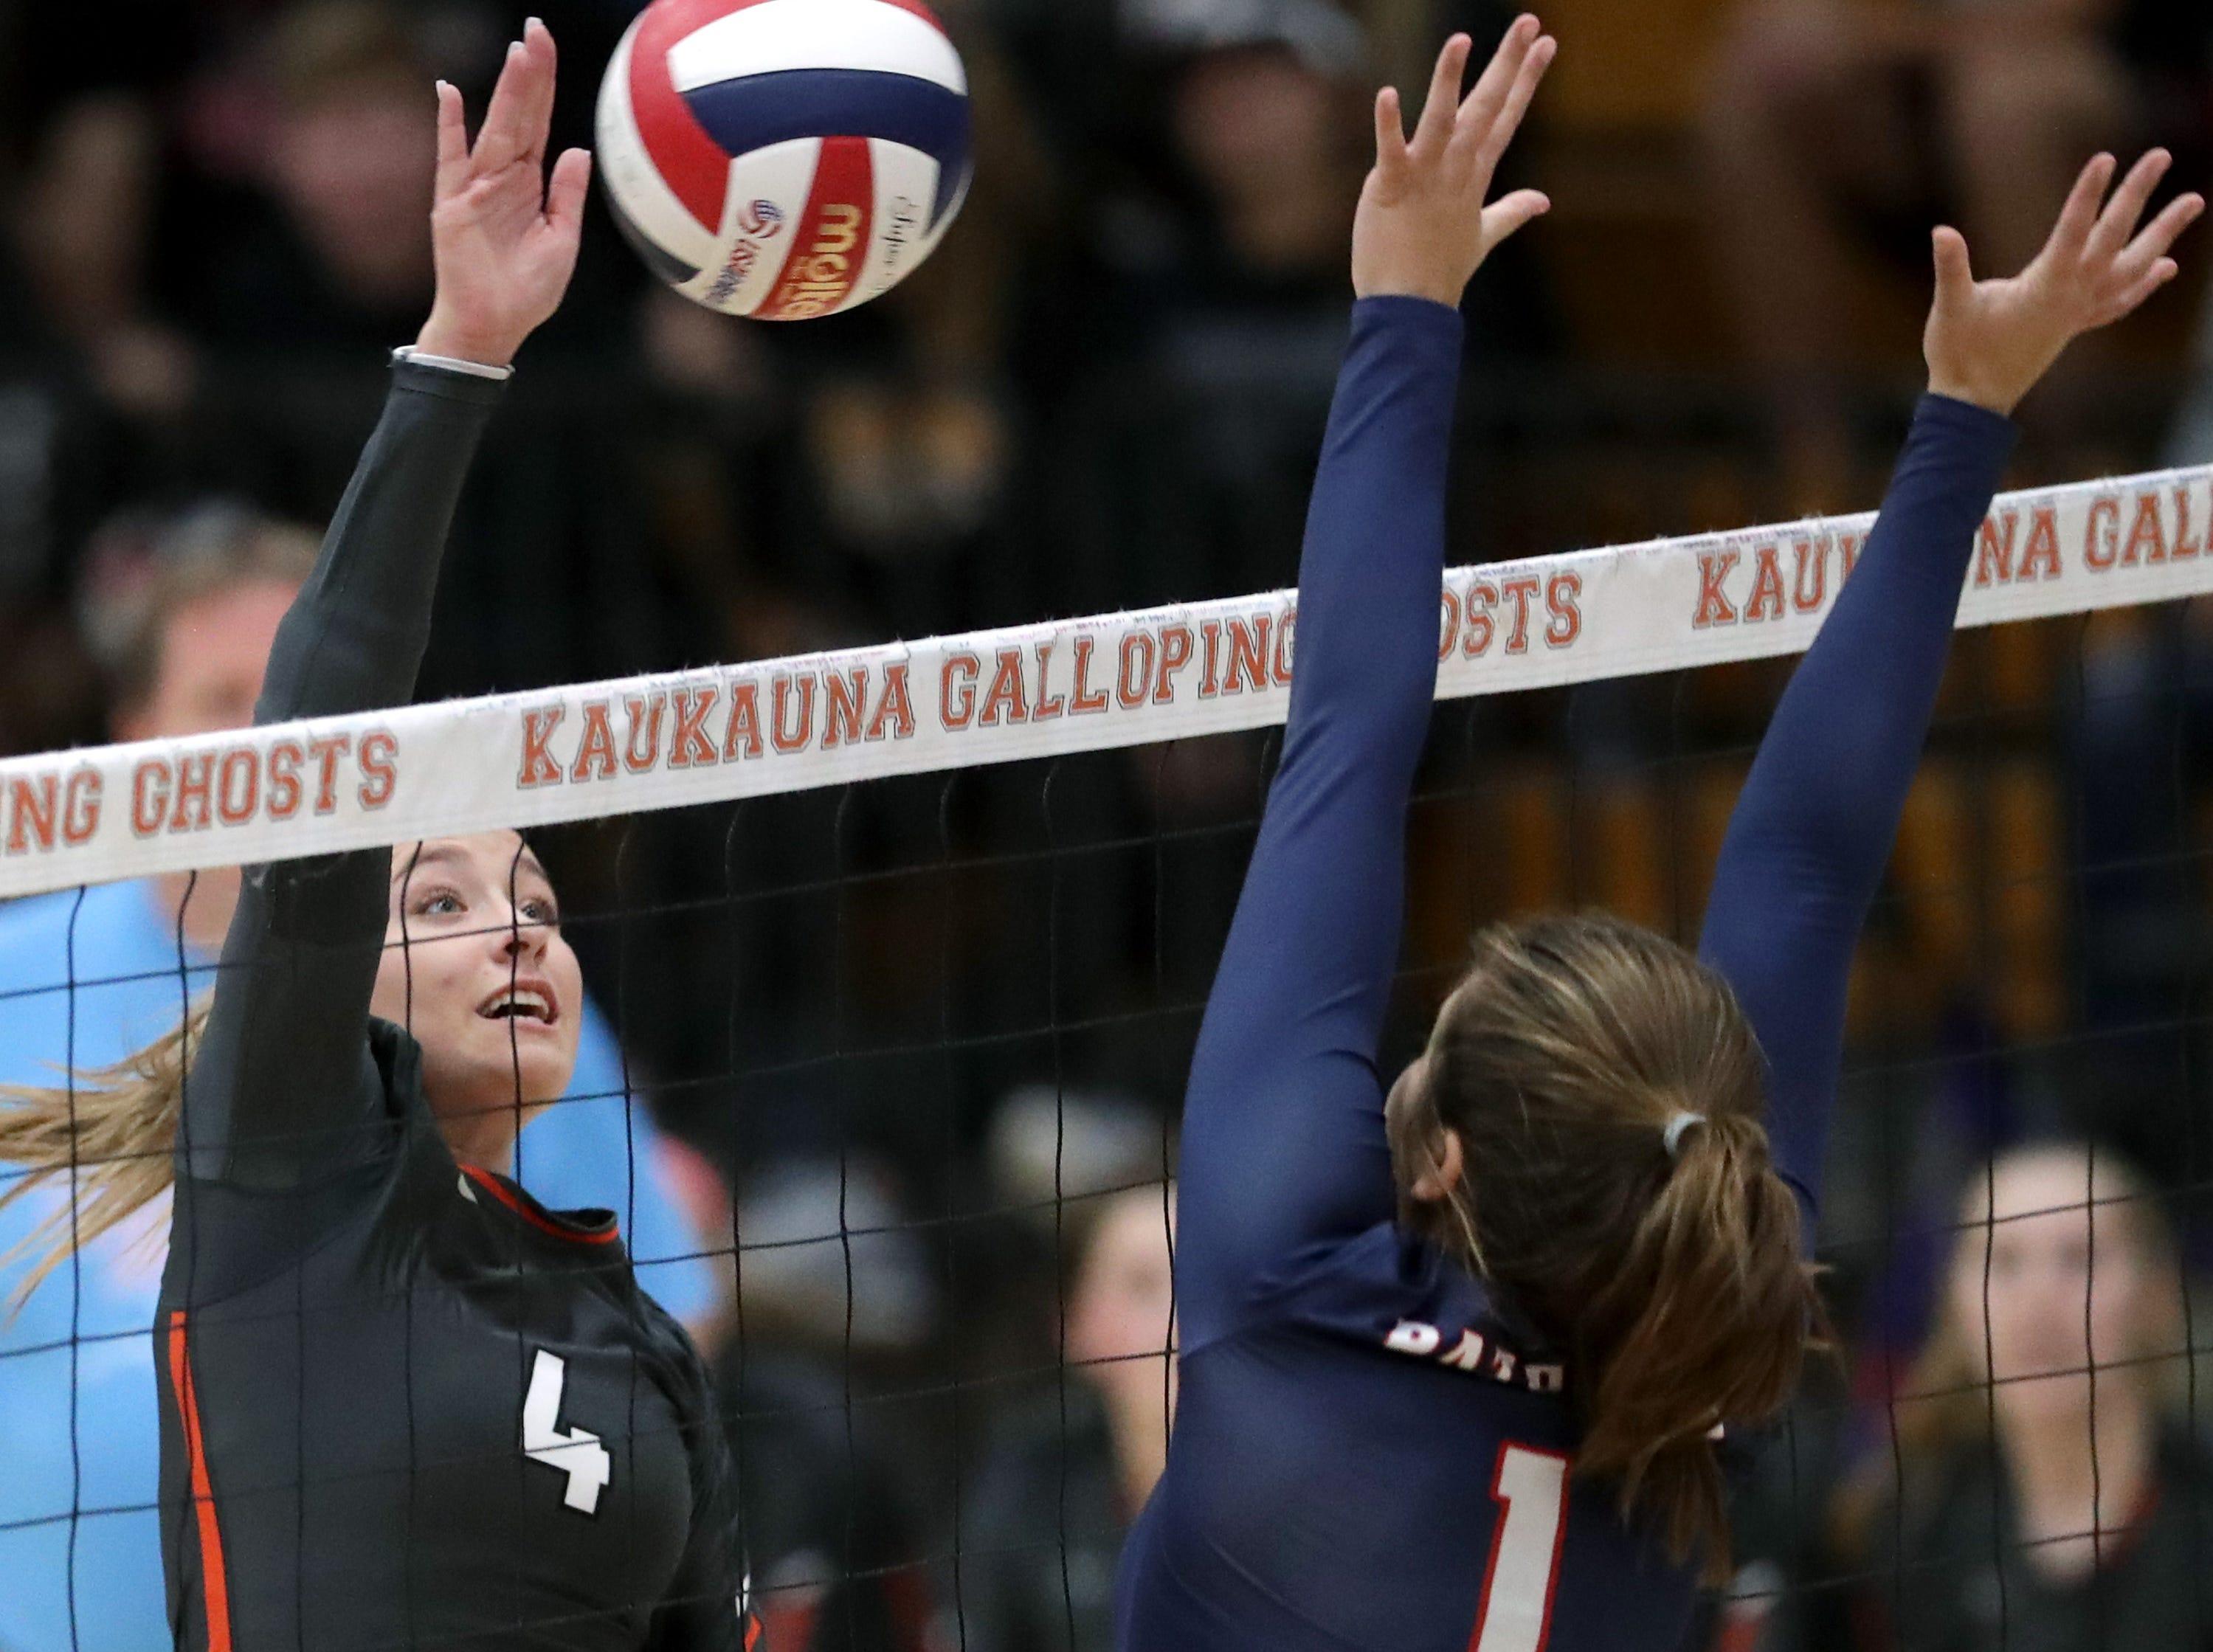 Kaukauna High School's #4 Taylor Ironside against Appleton East High School's #1 Olivia Meissner during their girls volleyball game on Thursday, October 11, 2018, in Kaukauna, Wis. Wm. Glasheen/USA TODAY NETWORK-Wisconsin.